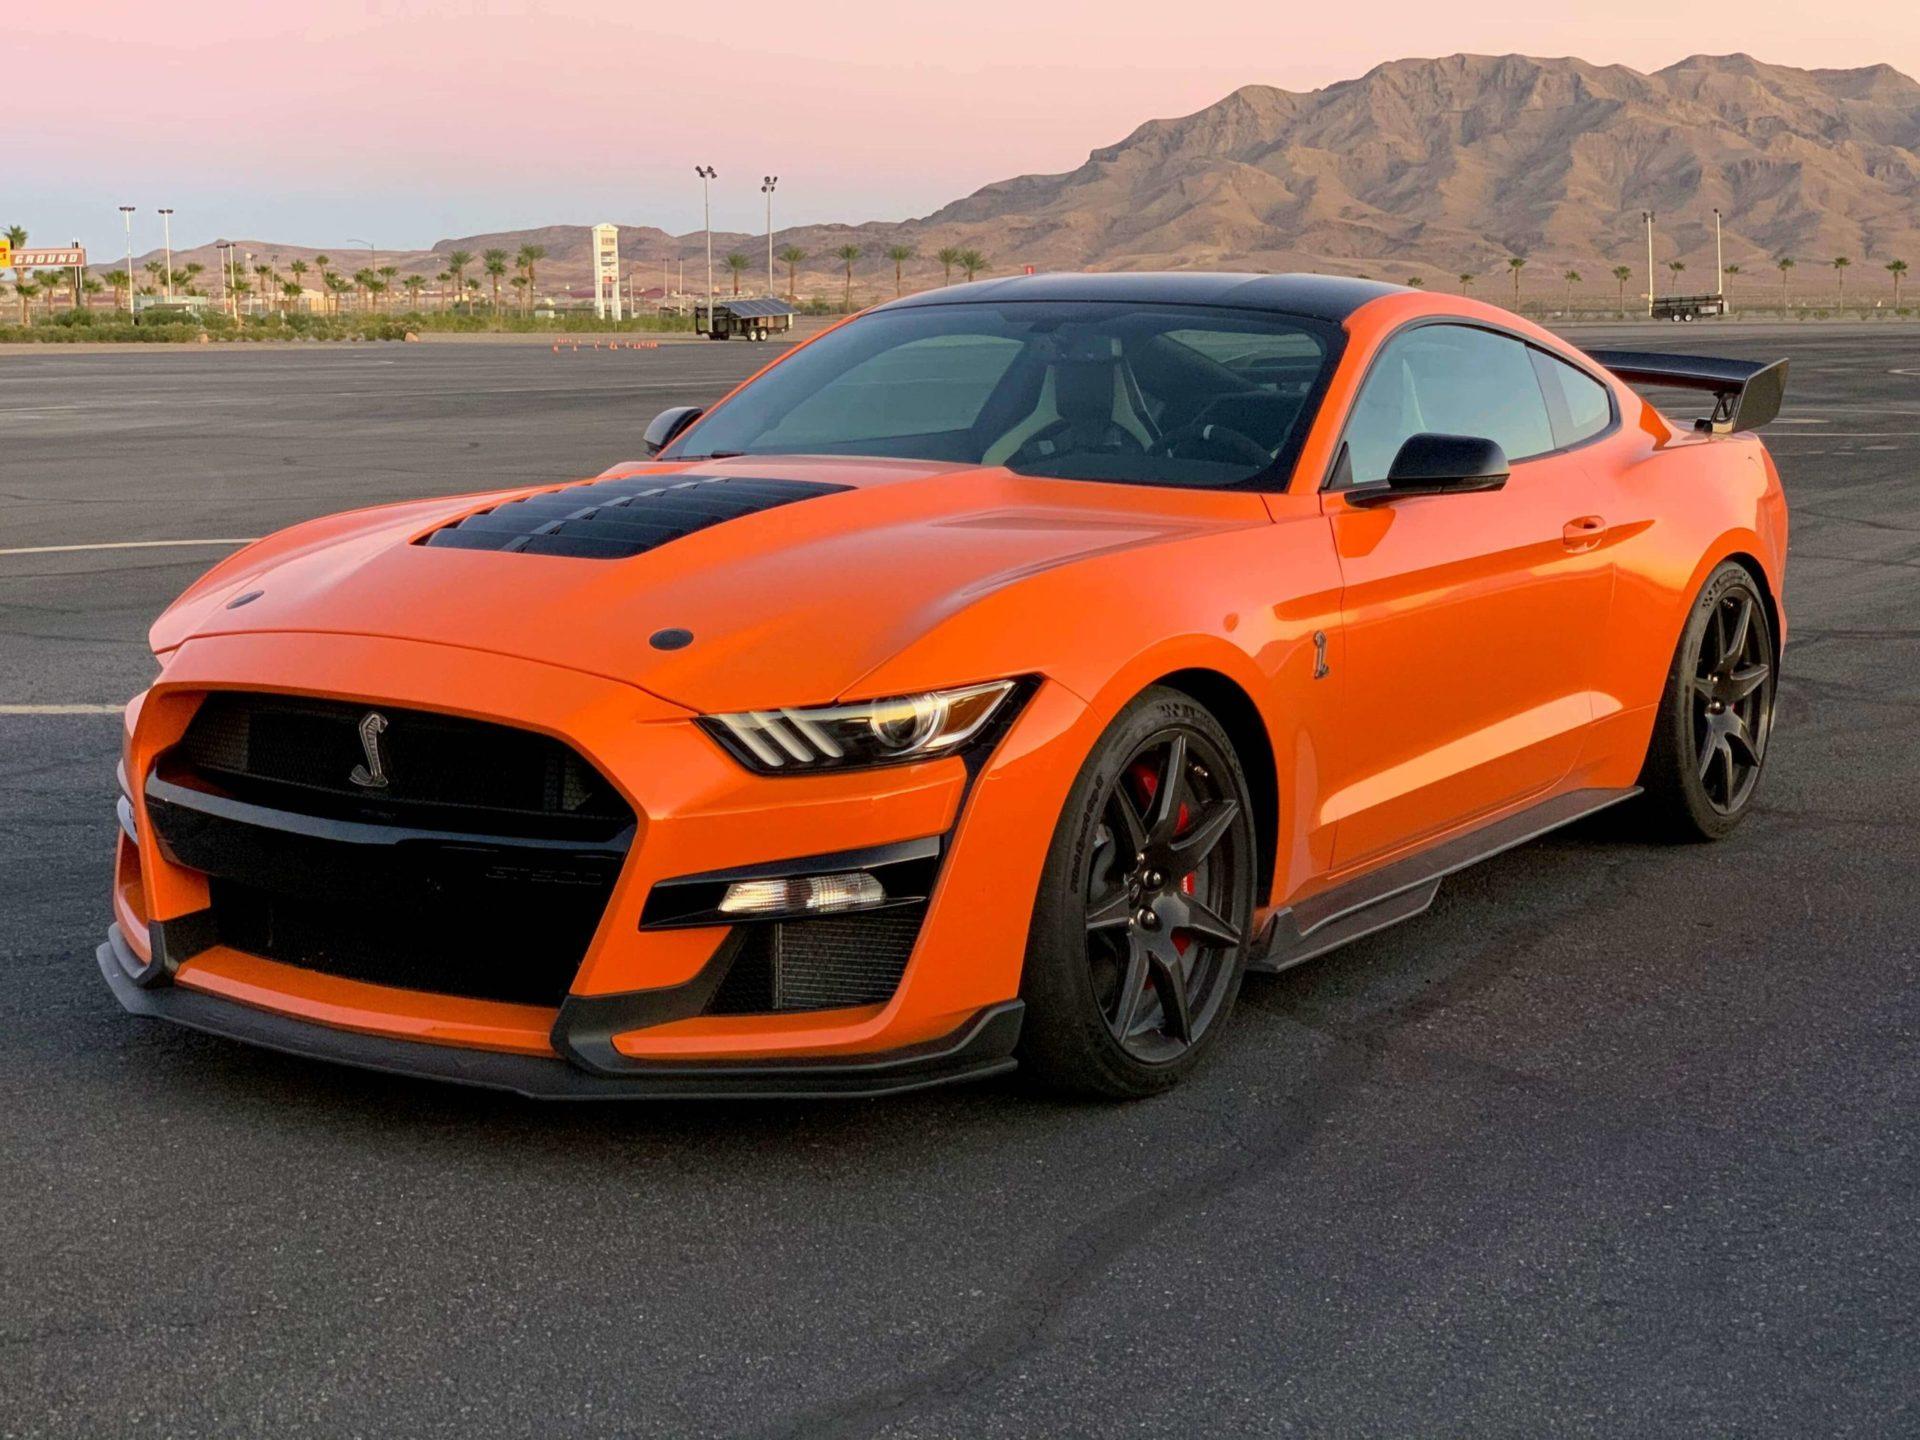 2020 GT500 color options Twister Orange